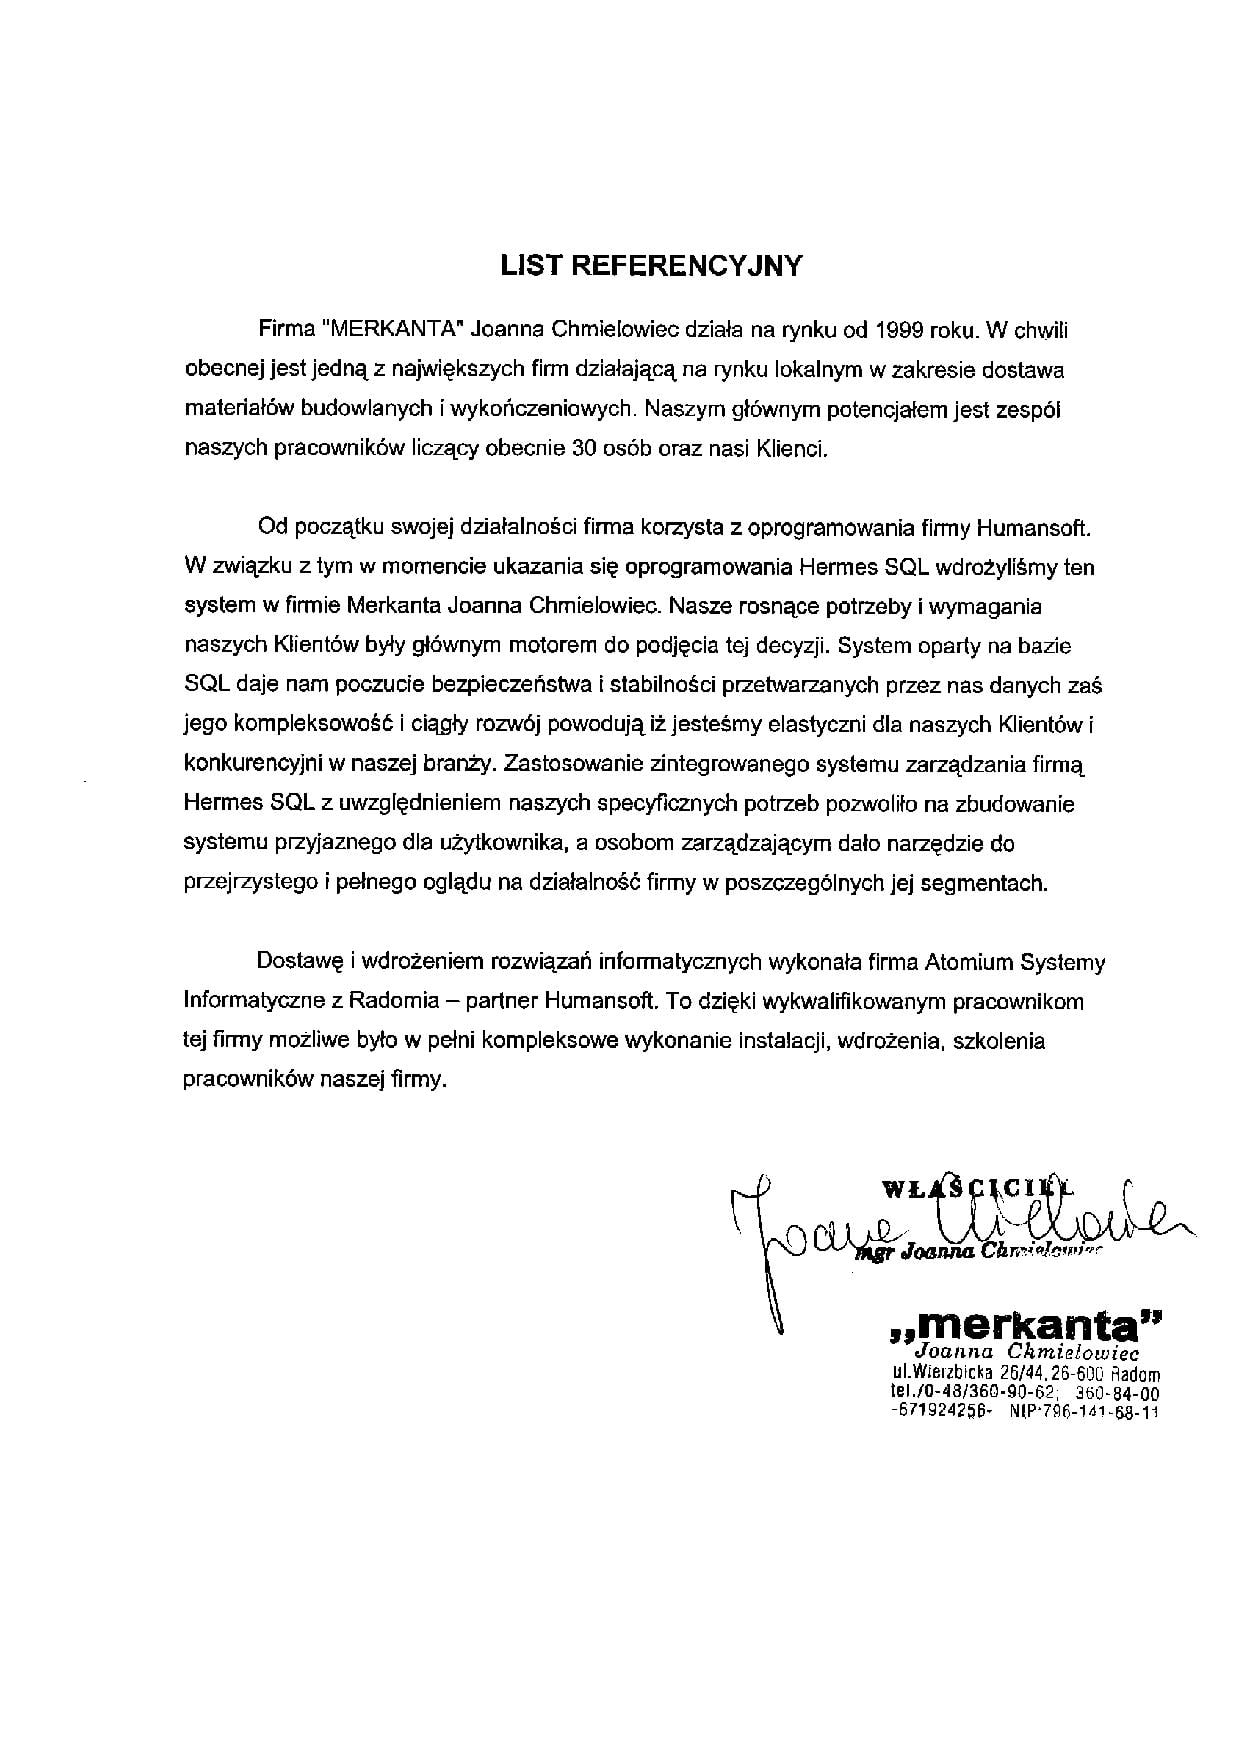 Merkanta - list referencyjny